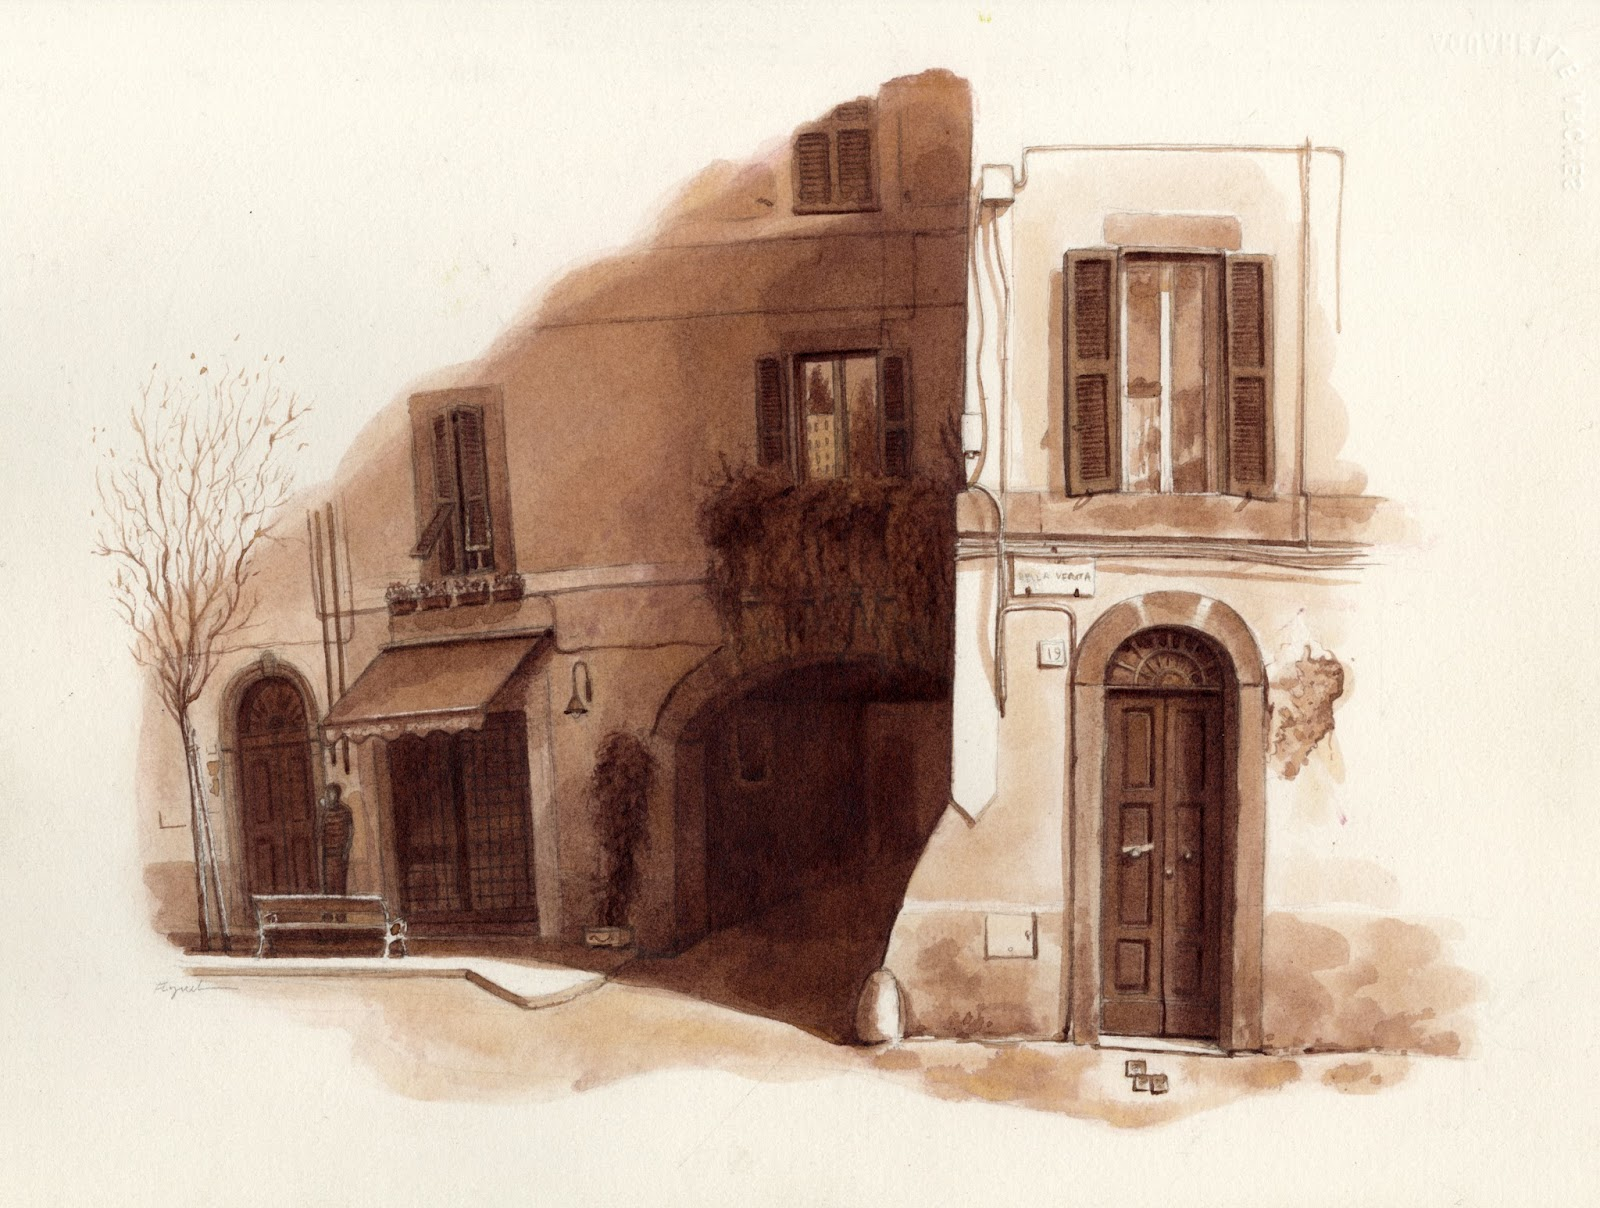 Stumbling Stones | Urban Sketchers